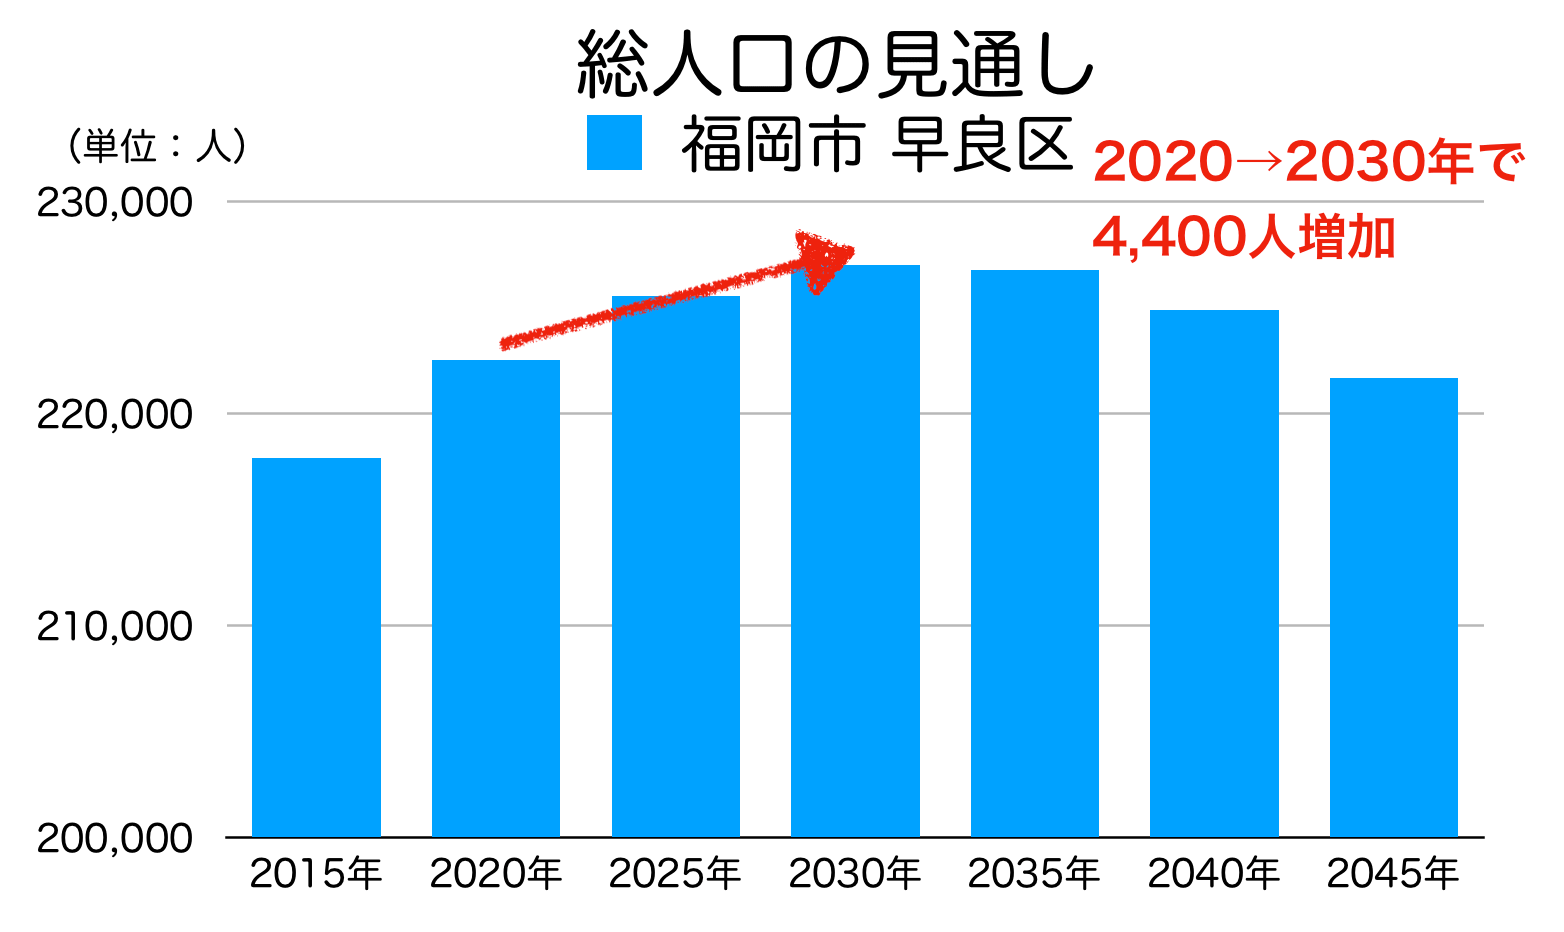 福岡市早良区の人口予測